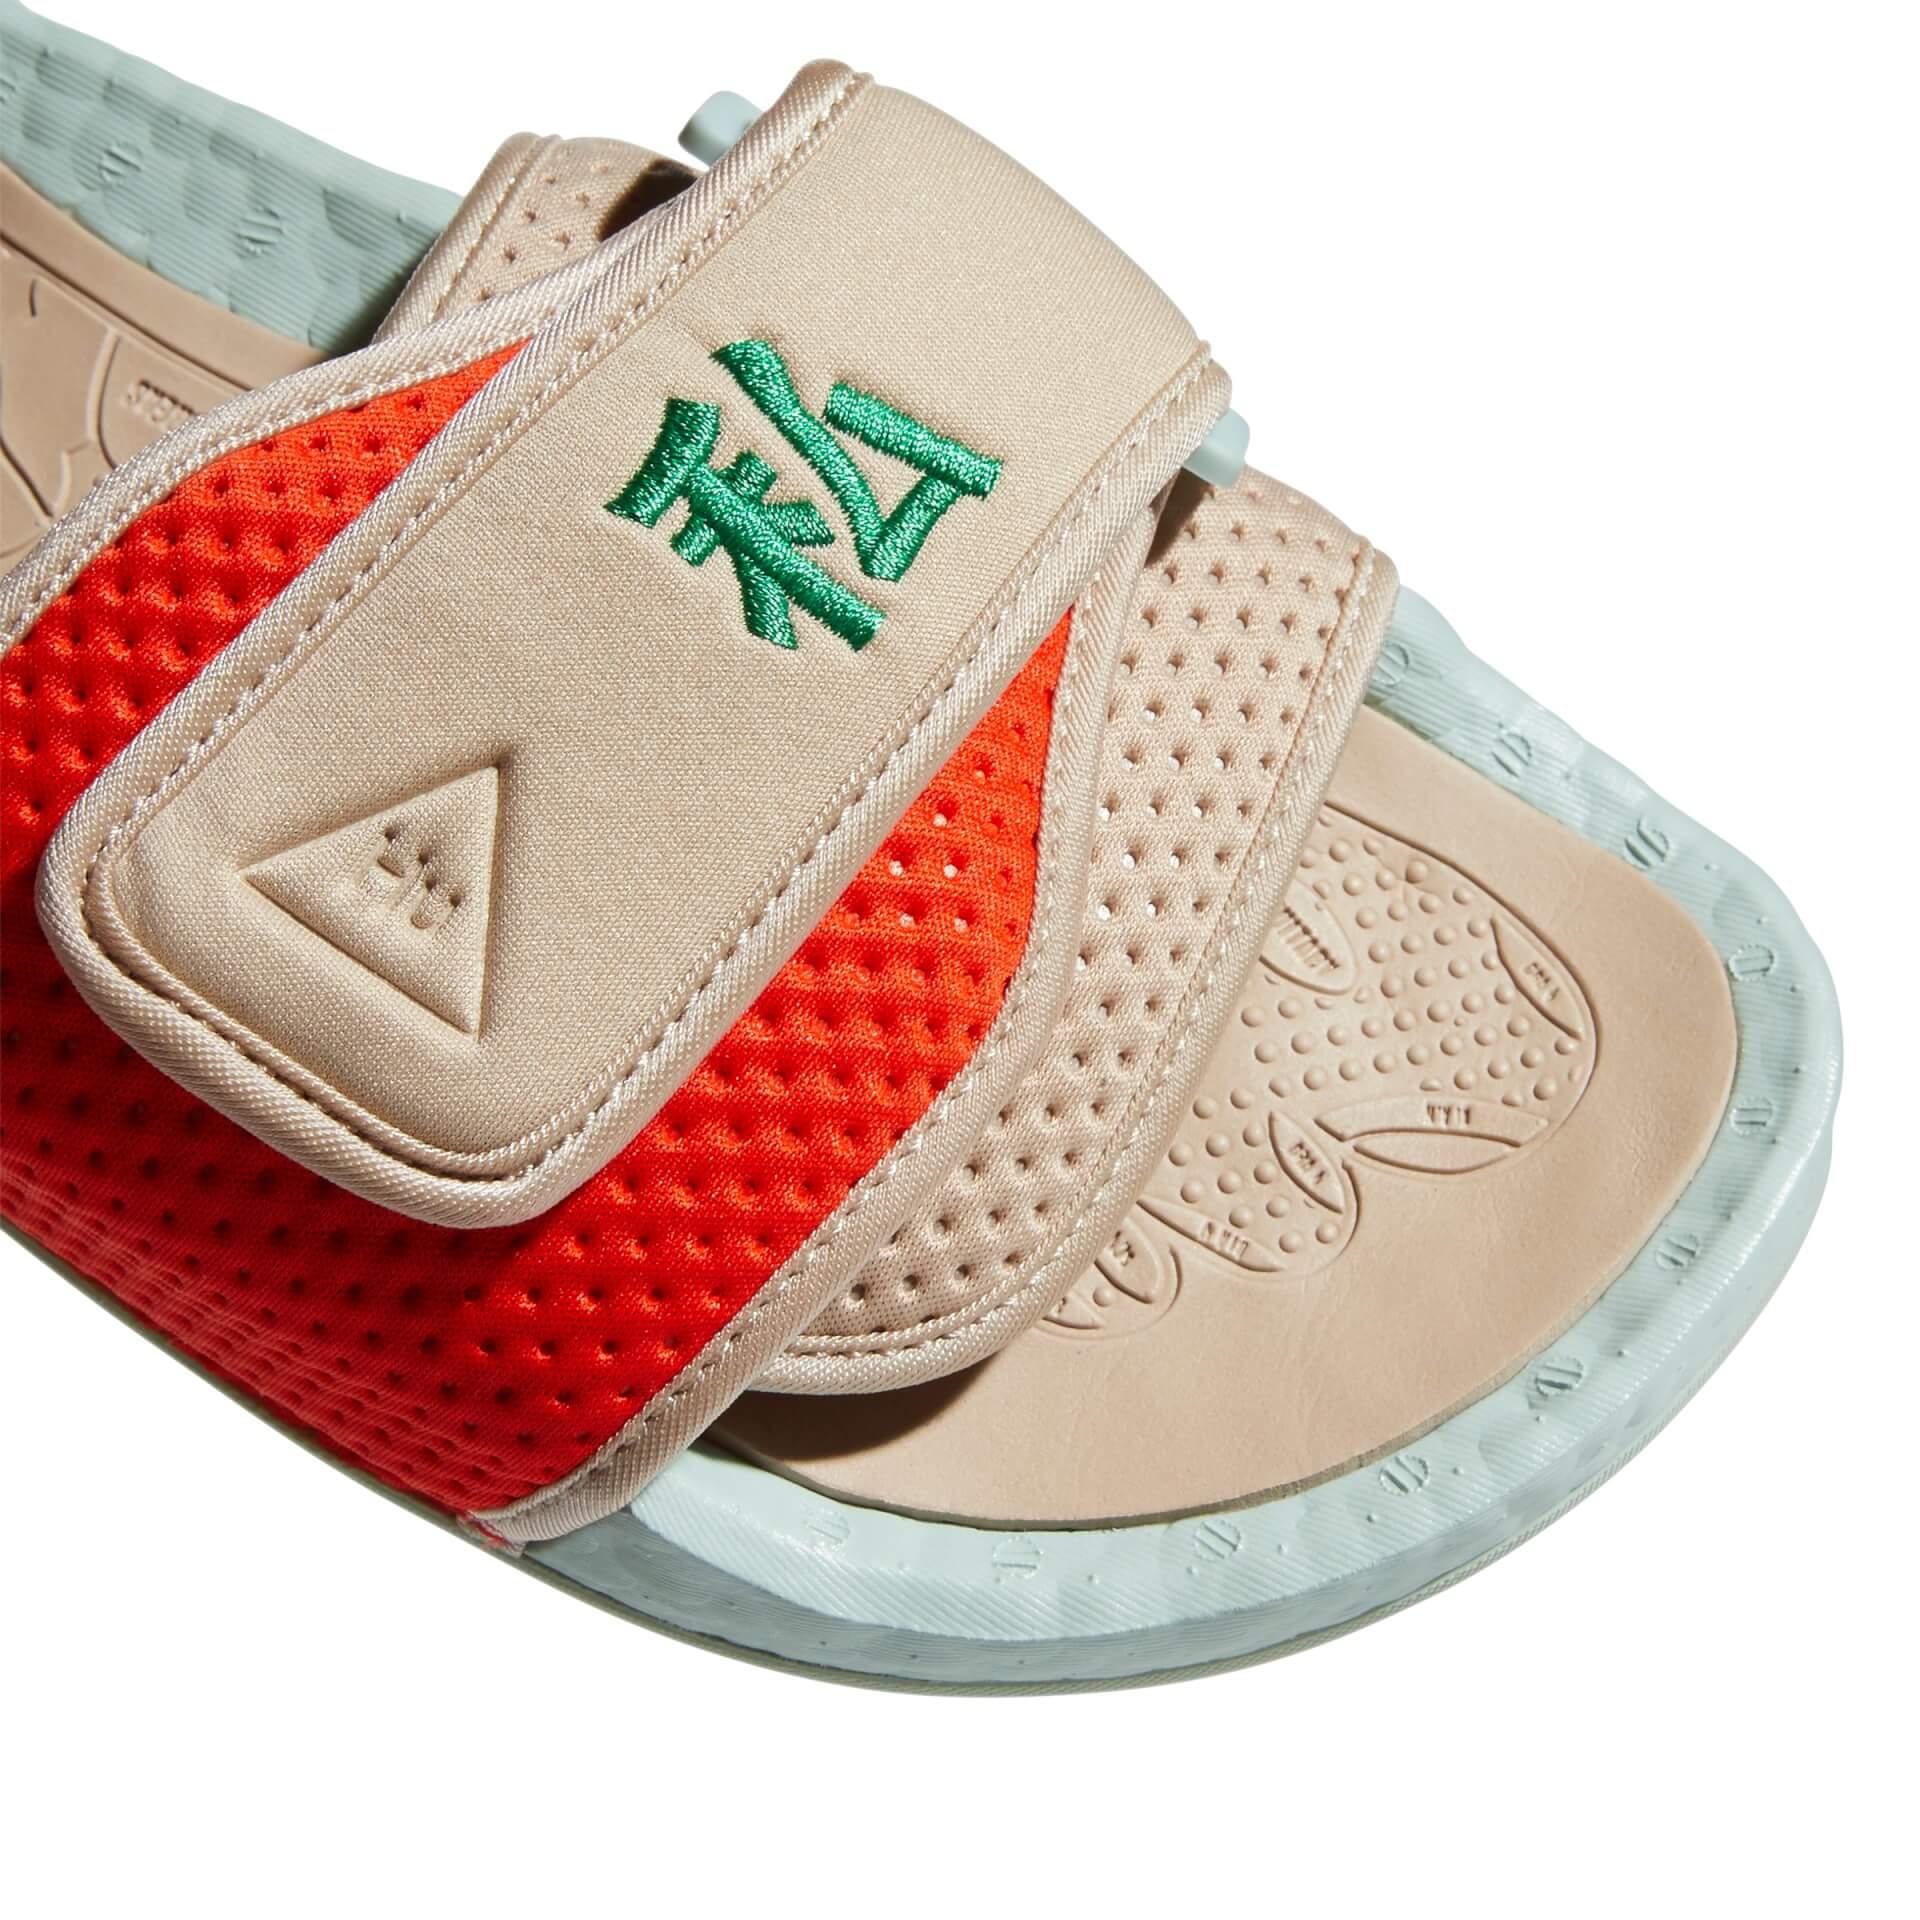 adidas Originalsから『Pharrell Williams x NIGO(R)FRIENDSHIP PACK』が発売!2種類のフットウェアが登場 fashion201217_adidas_pharrell_nigo_14